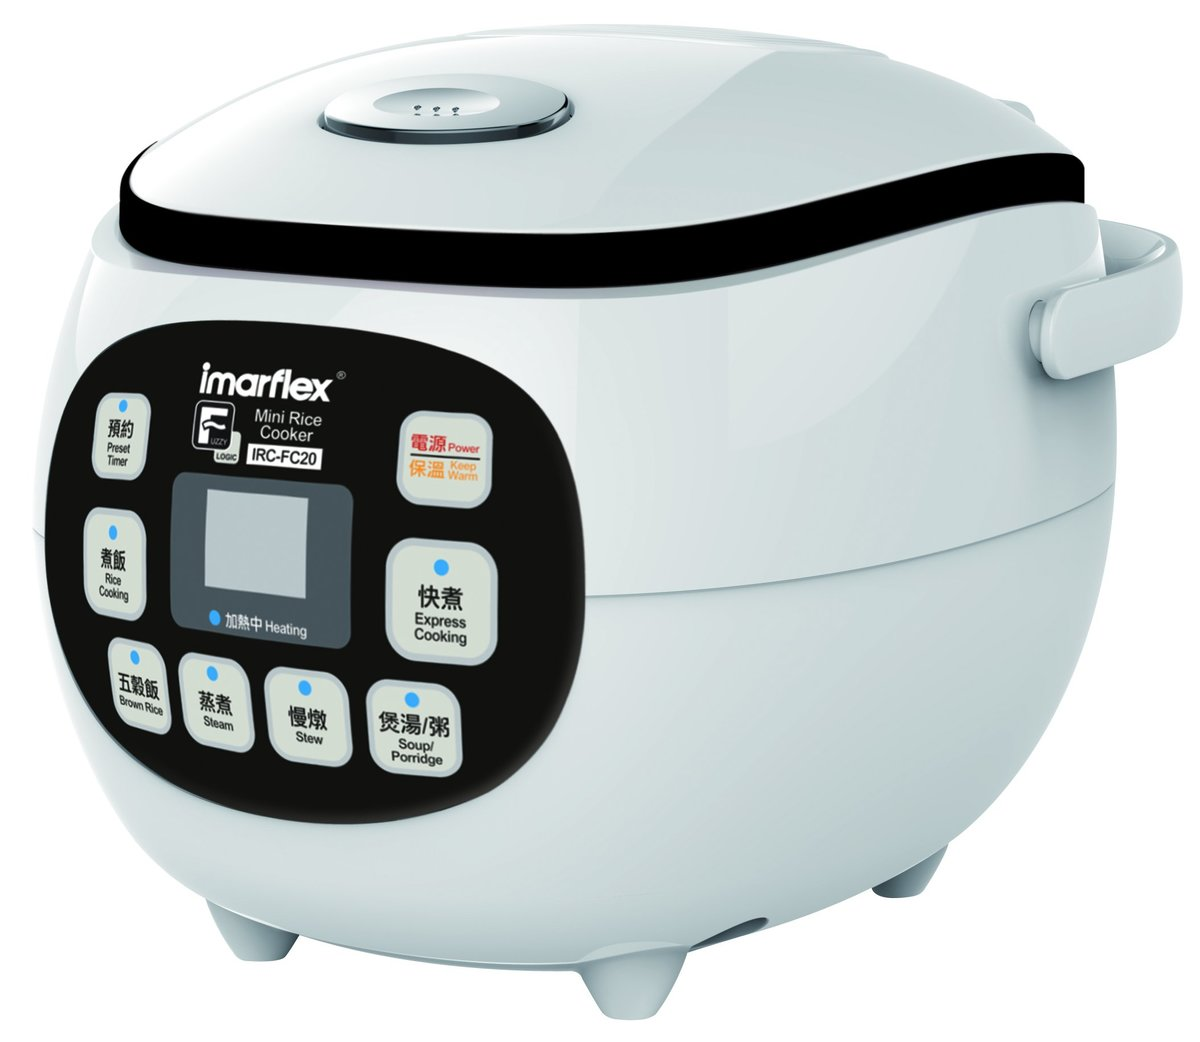 Imarflex 0.8L Fuzzy Logic Rice Cooker IRC-FC20